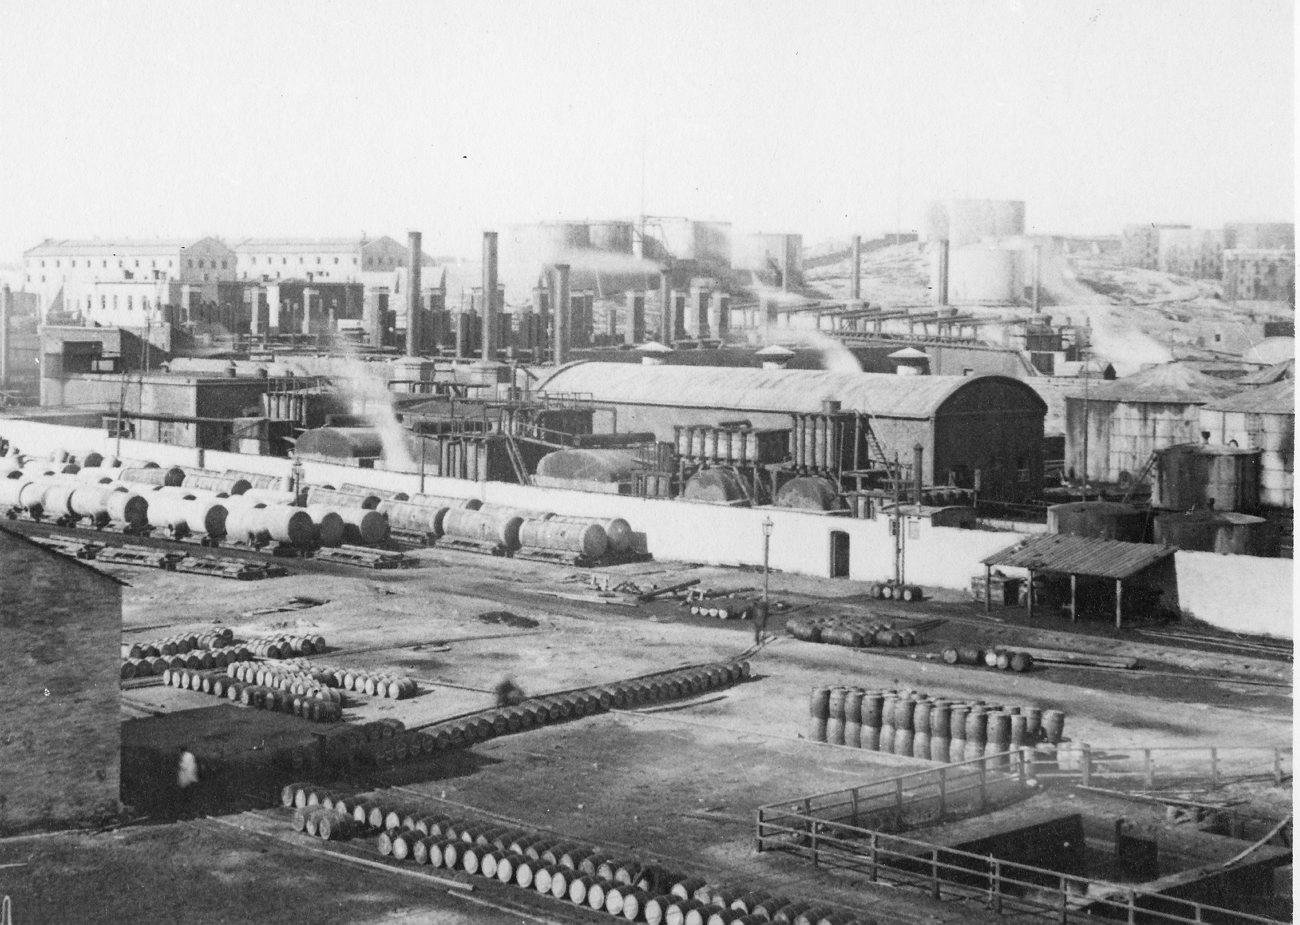 0_ec965_8099c1d8_origПанорама завода Нобеля в Баку